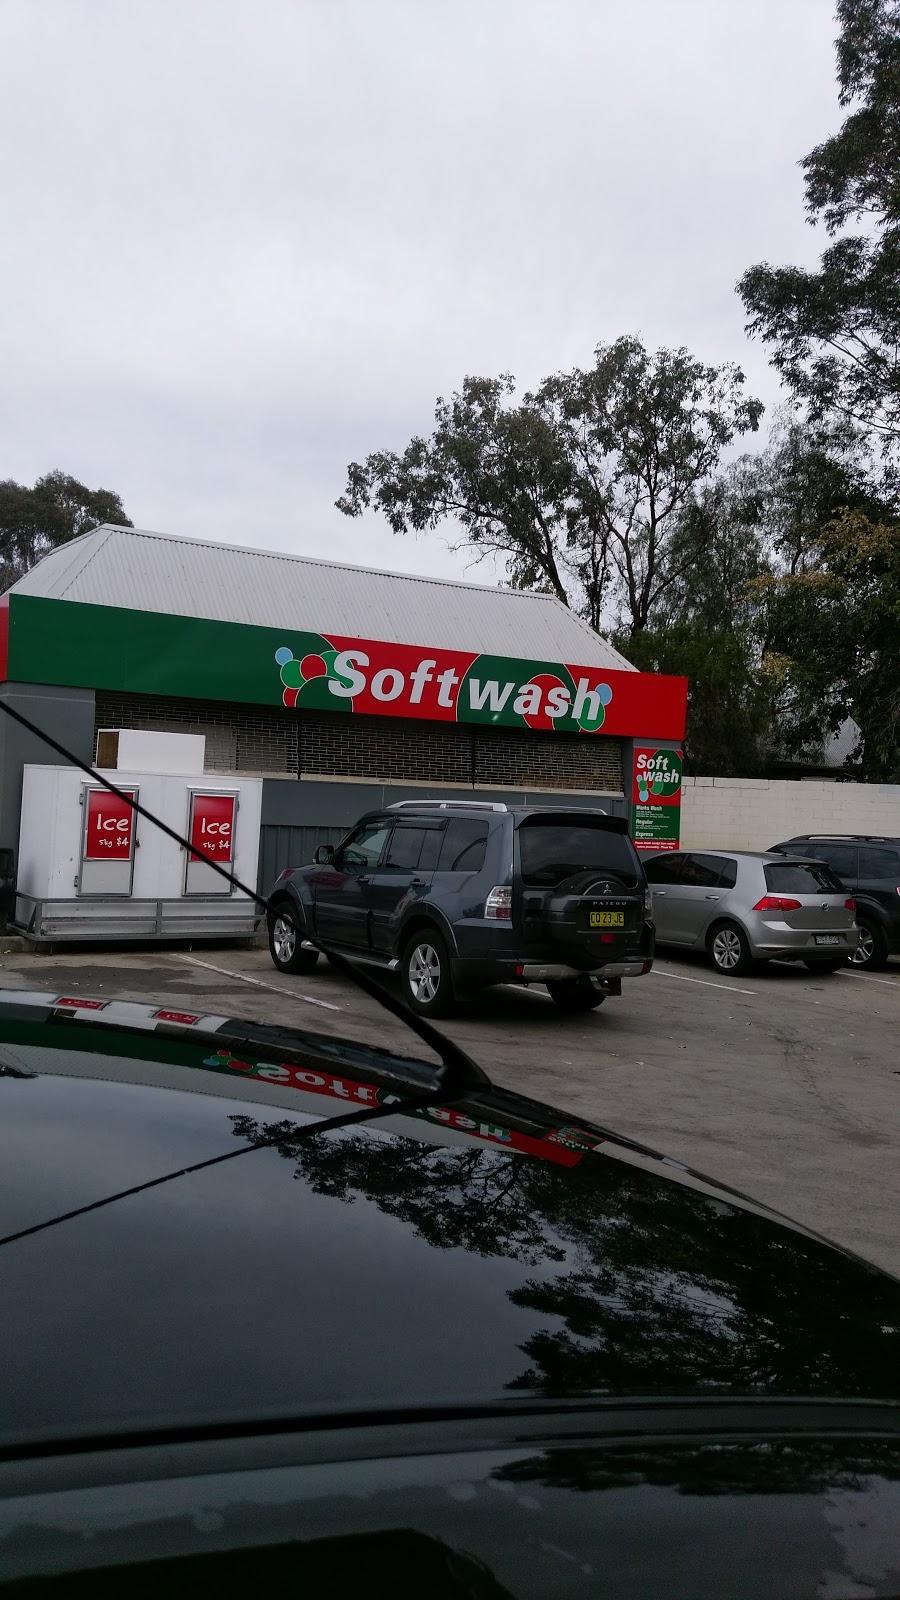 7-Eleven Windsor | convenience store | 12 Hawkesbury Valley Way, Windsor NSW 2756, Australia | 0245775541 OR +61 2 4577 5541